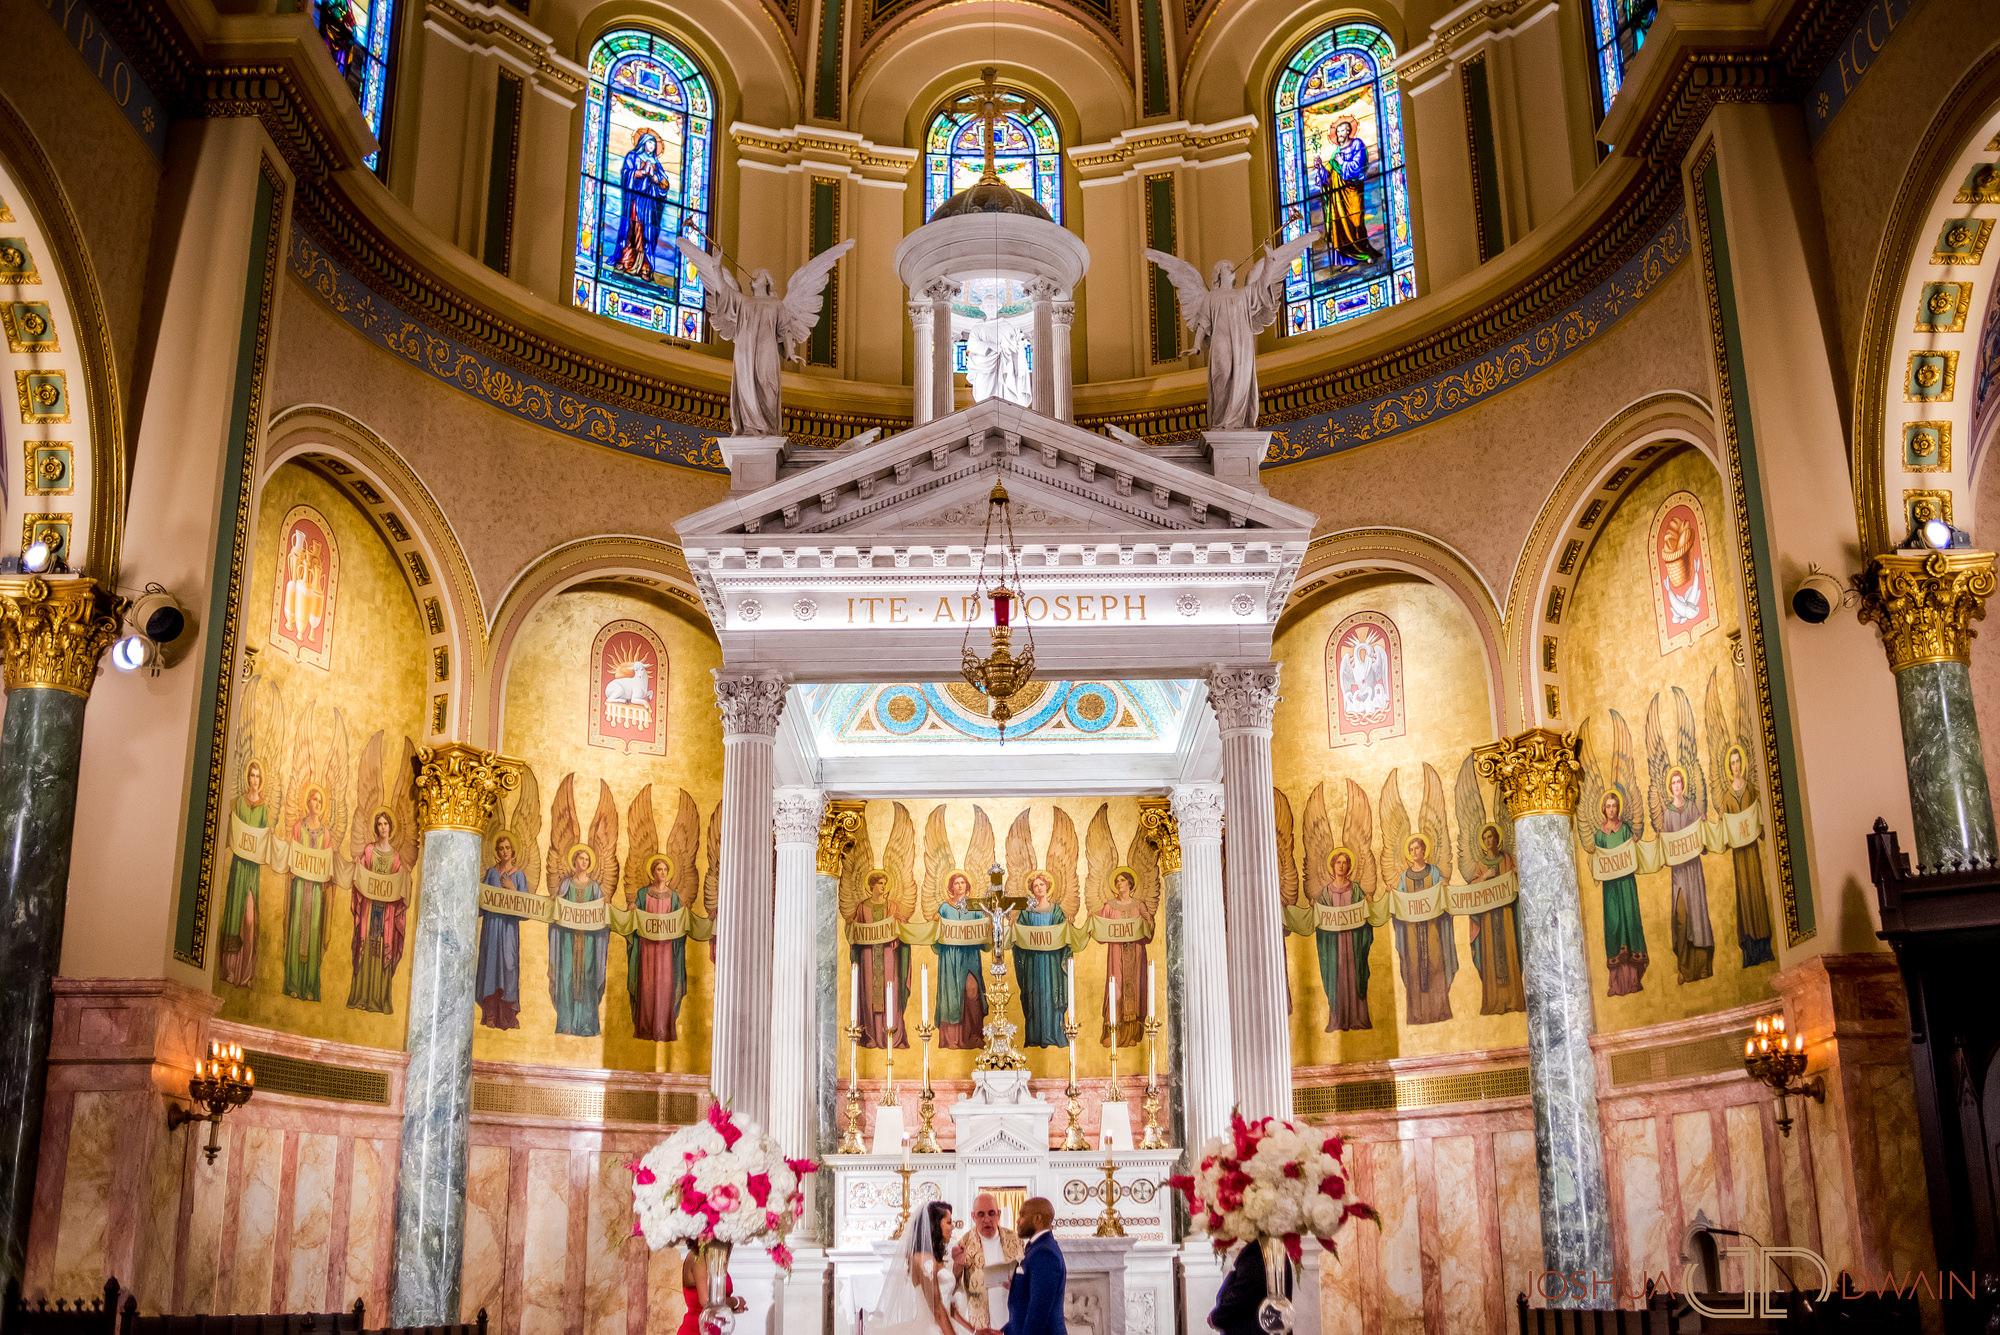 heidi-justin-014-liberty-warehouse-Co-Cathedral-of-St-Joseph -brooklyn-ny-wedding-photographer-joshua-dwain